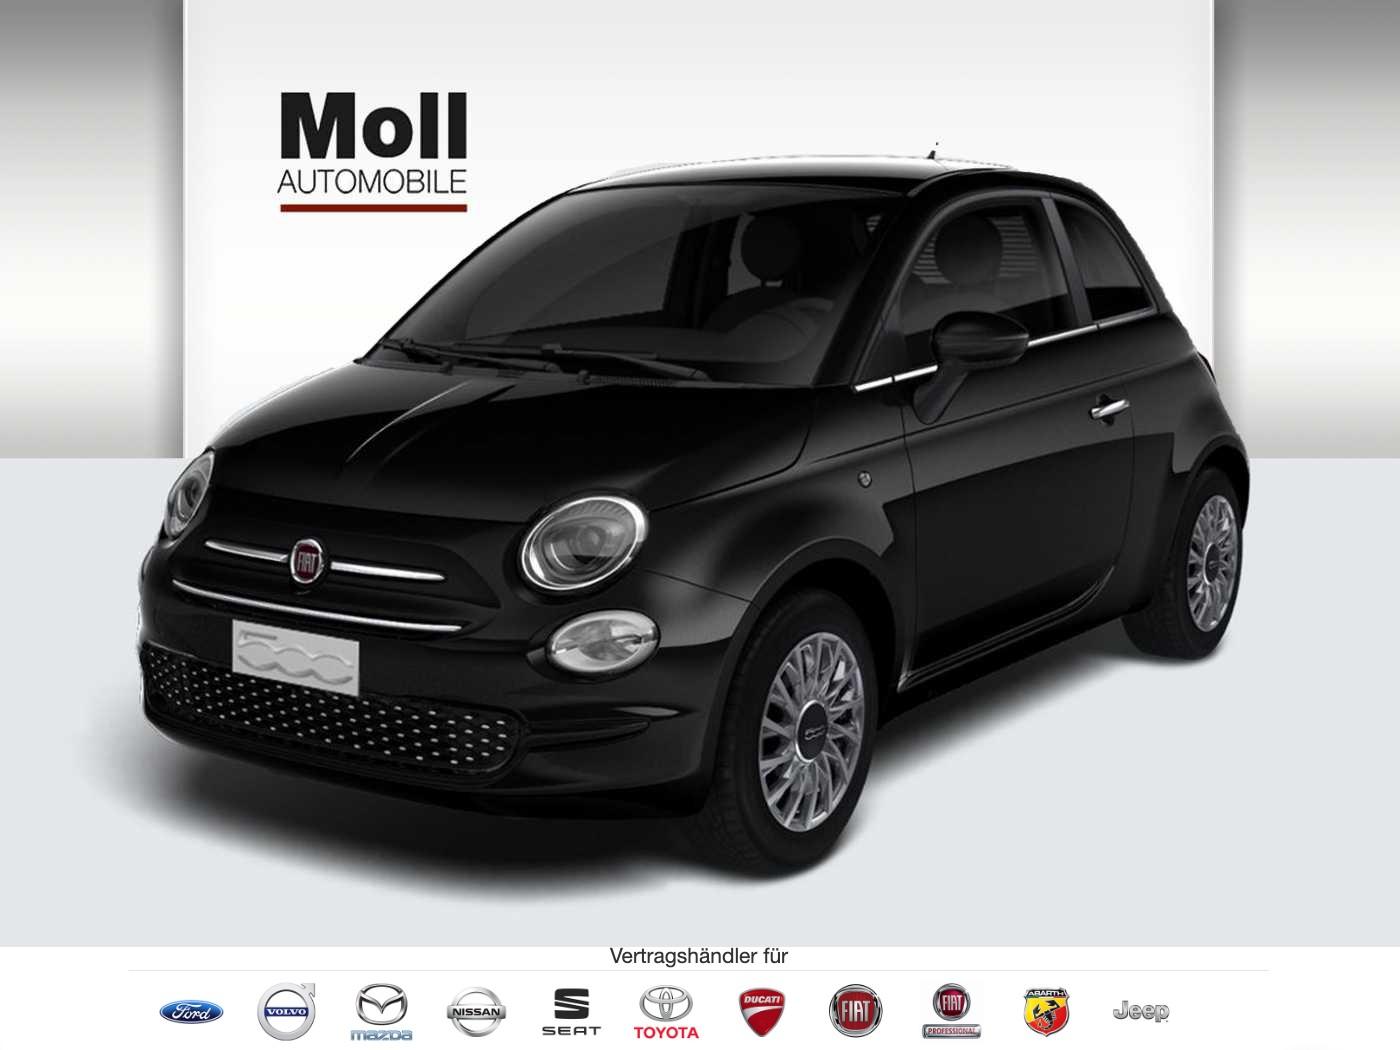 Fiat 500 Serie 7 Apple CarPlay, Klima, Bluetooth, Alu, Vesuvio schwarz '2020', Jahr 2019, Benzin